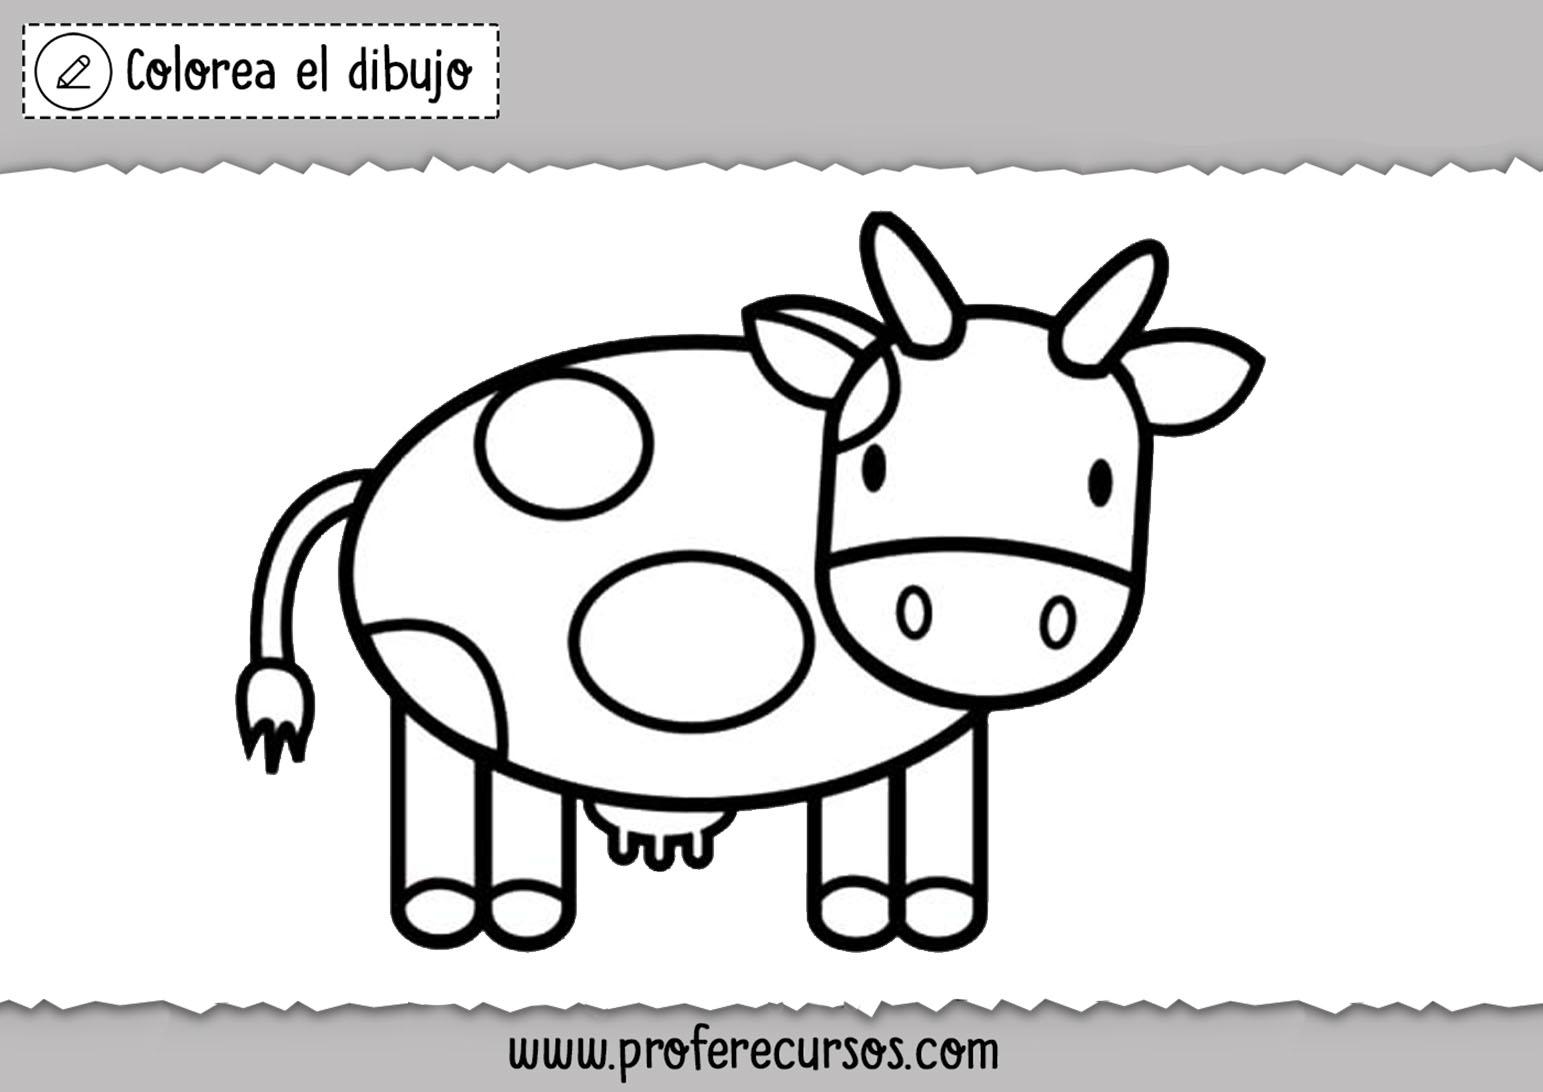 Dibujo de vaca facil